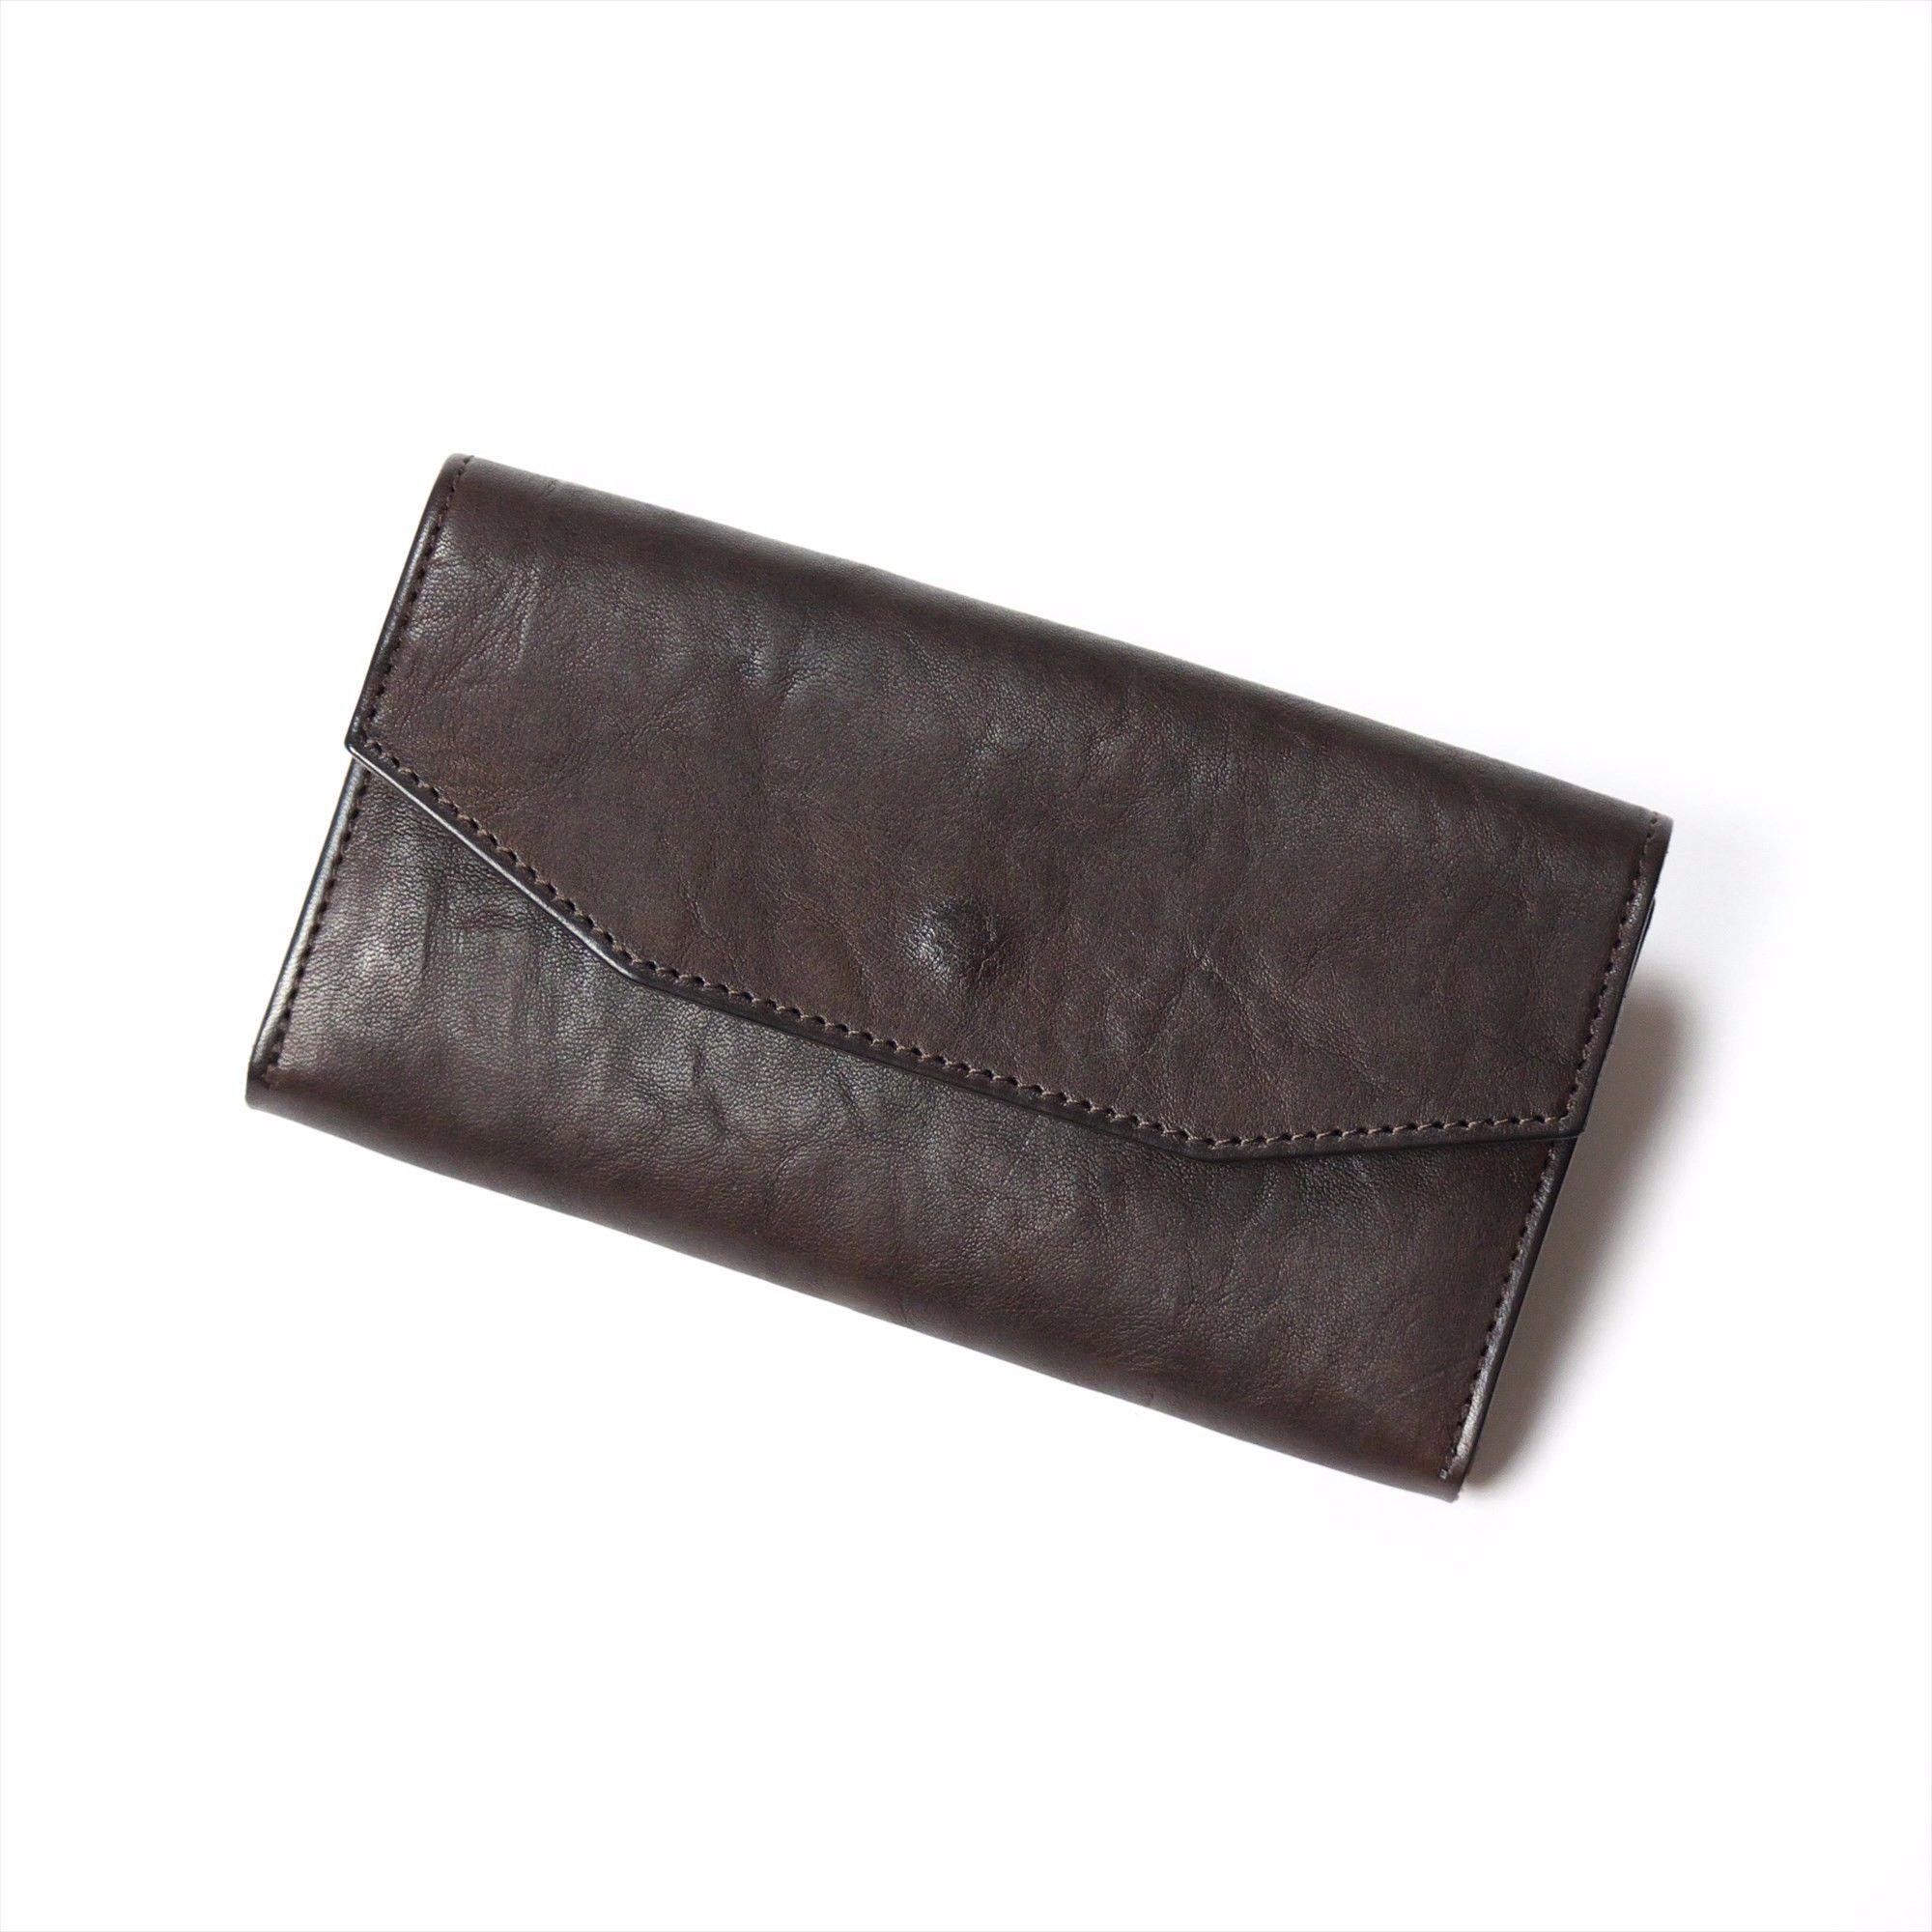 ANNAK ギャルソン型長財布 ダークブラウン AK14TA-B0039